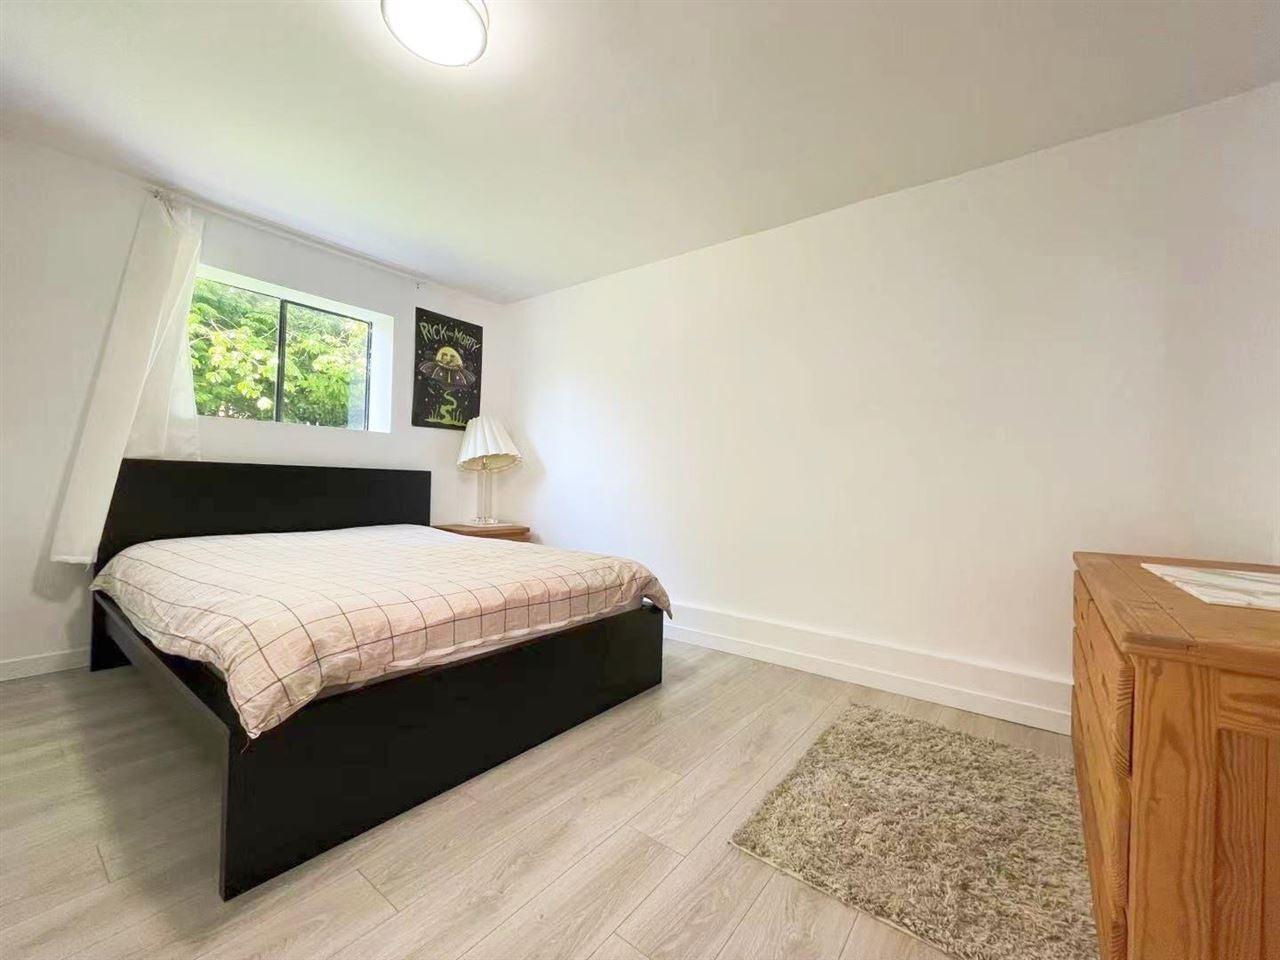 8991 ST. ALBANS ROAD - Garden City 1/2 Duplex for sale, 5 Bedrooms (R2576083) - #19